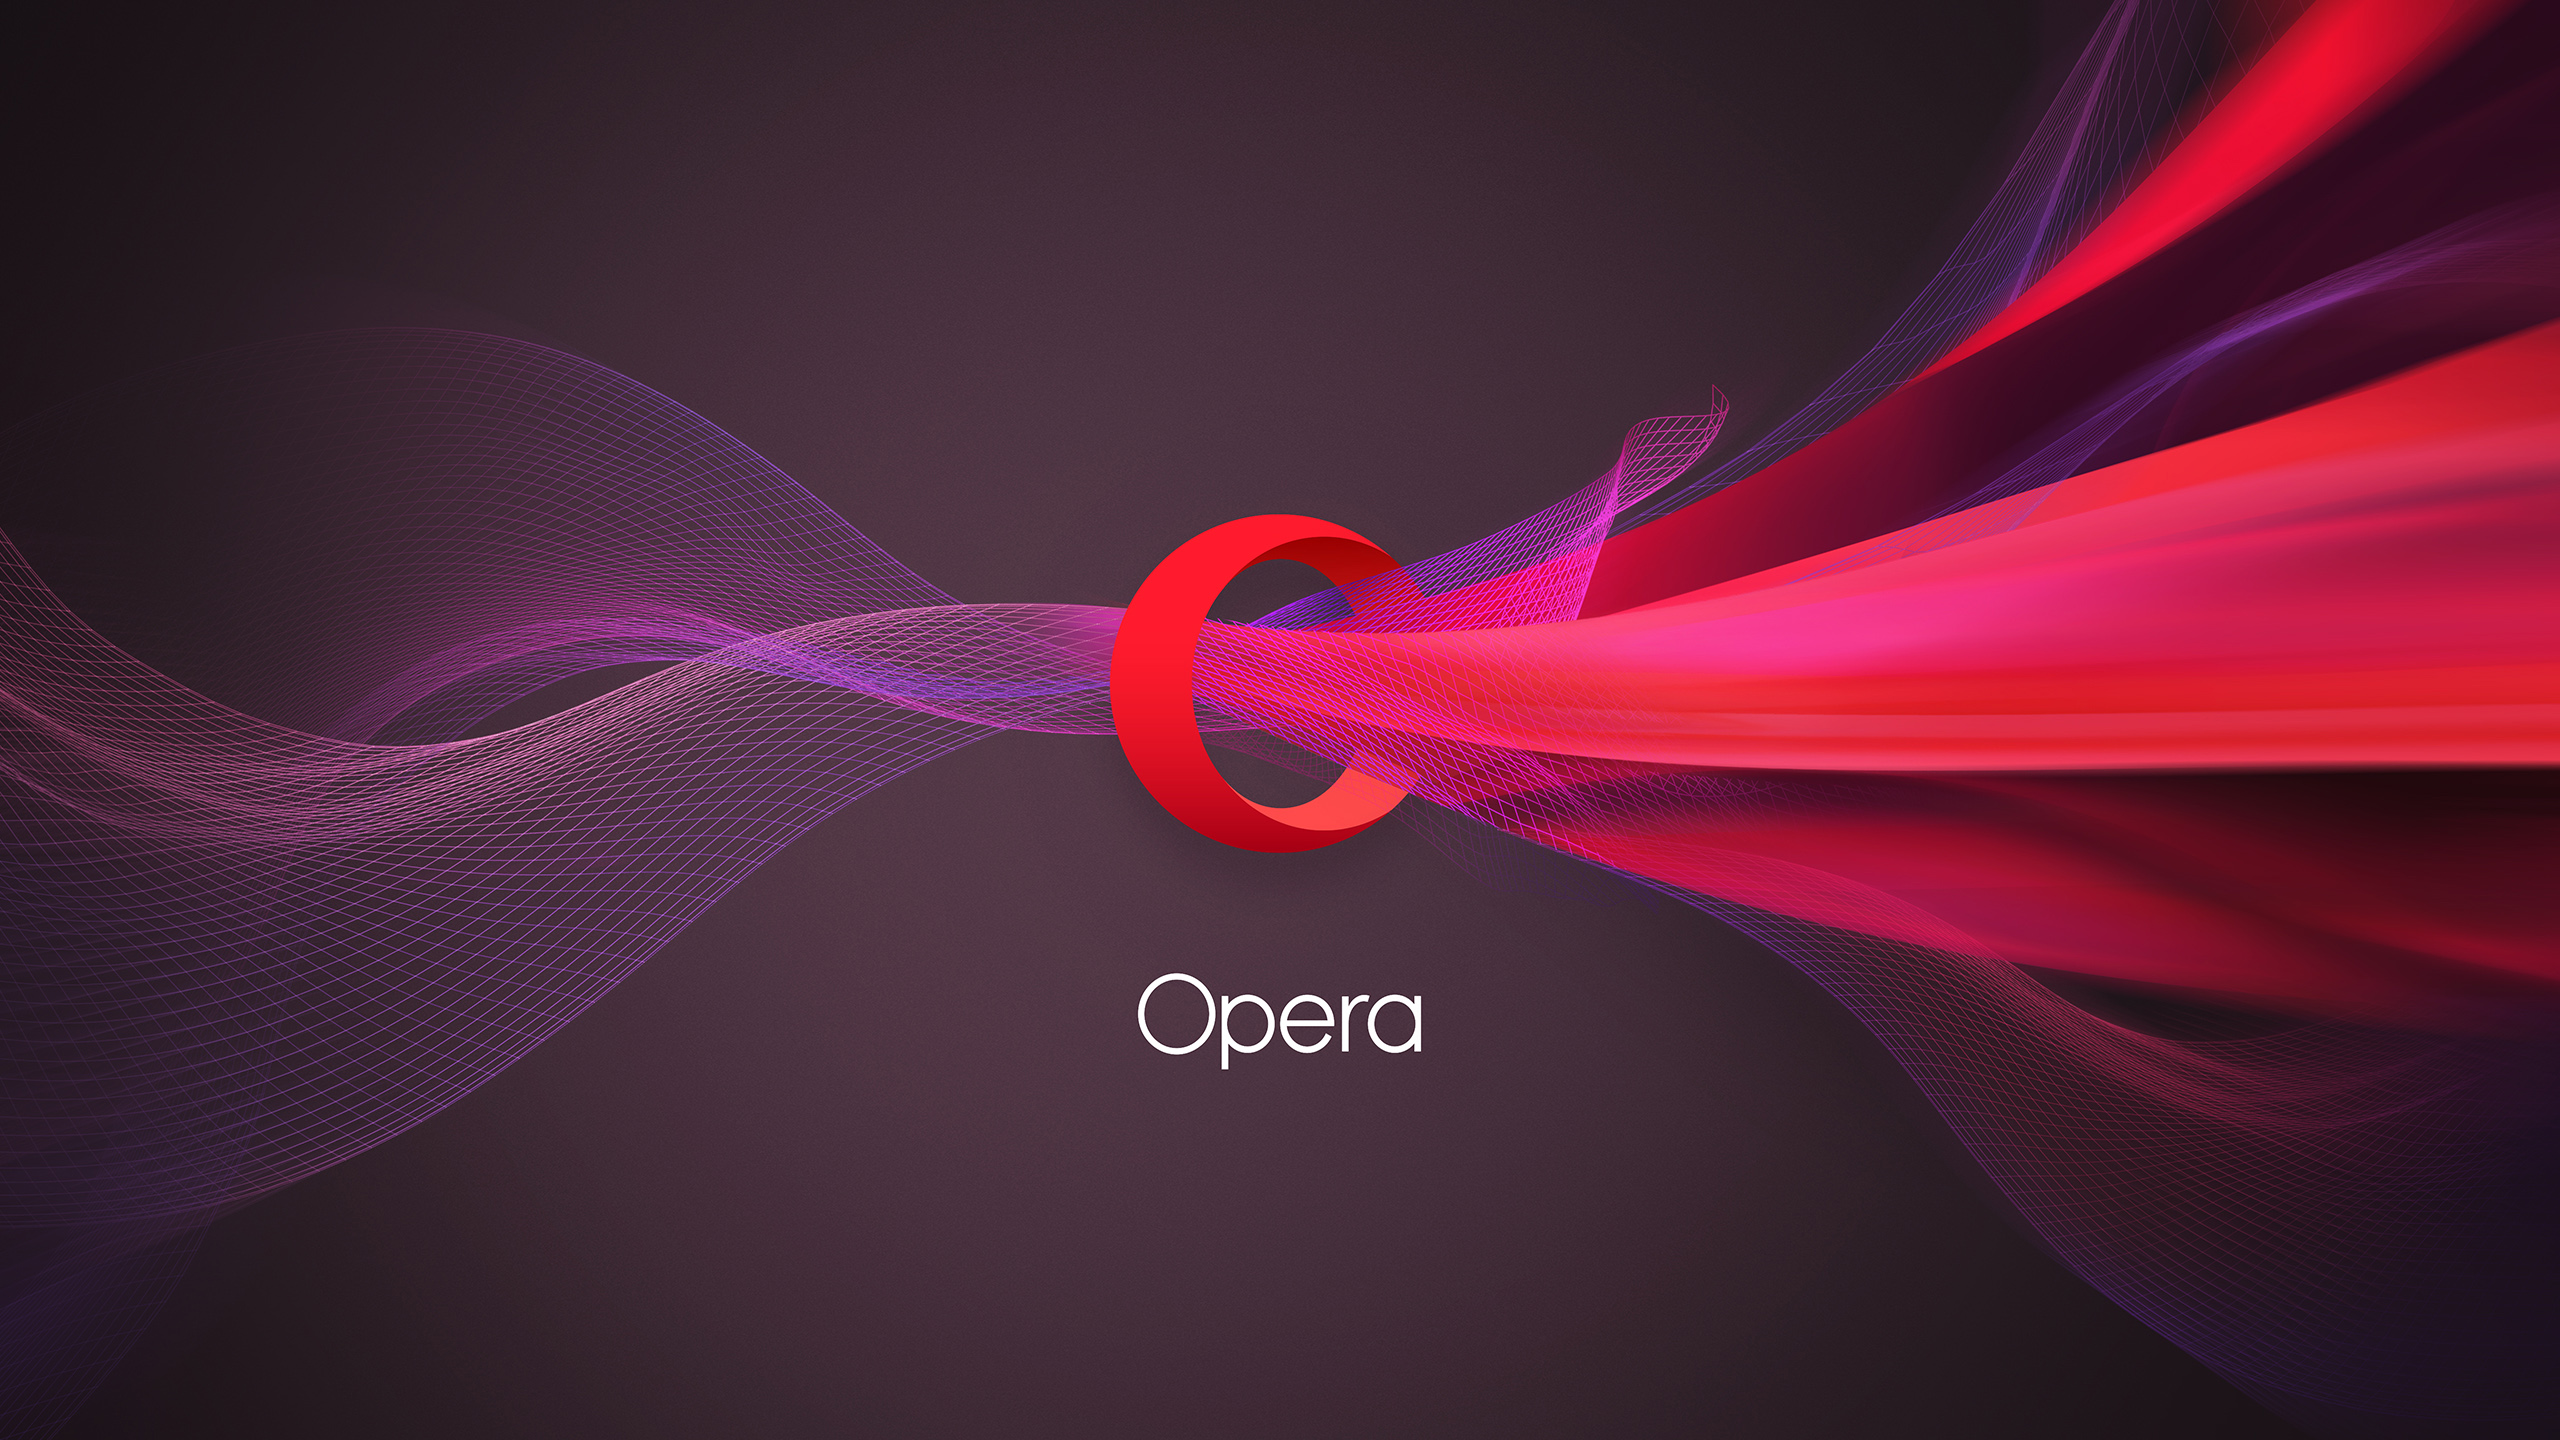 opera-new-logo-wallpaper-computer-2560x1440.jpg